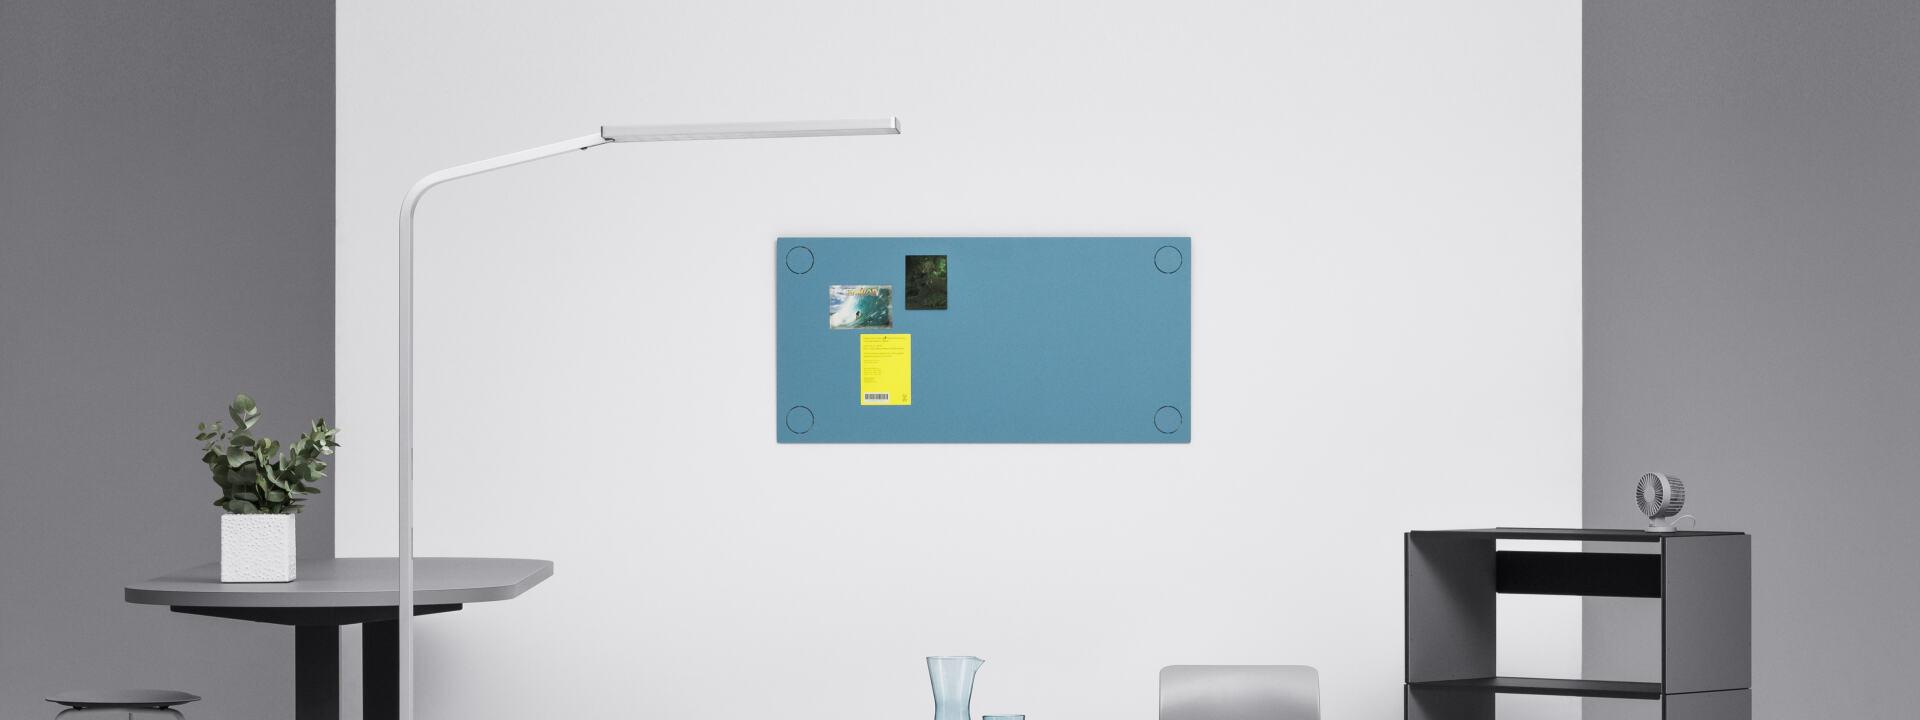 magnet pinnwand by michael anton kastenbauer b ro zuhause faust linoleum eu. Black Bedroom Furniture Sets. Home Design Ideas